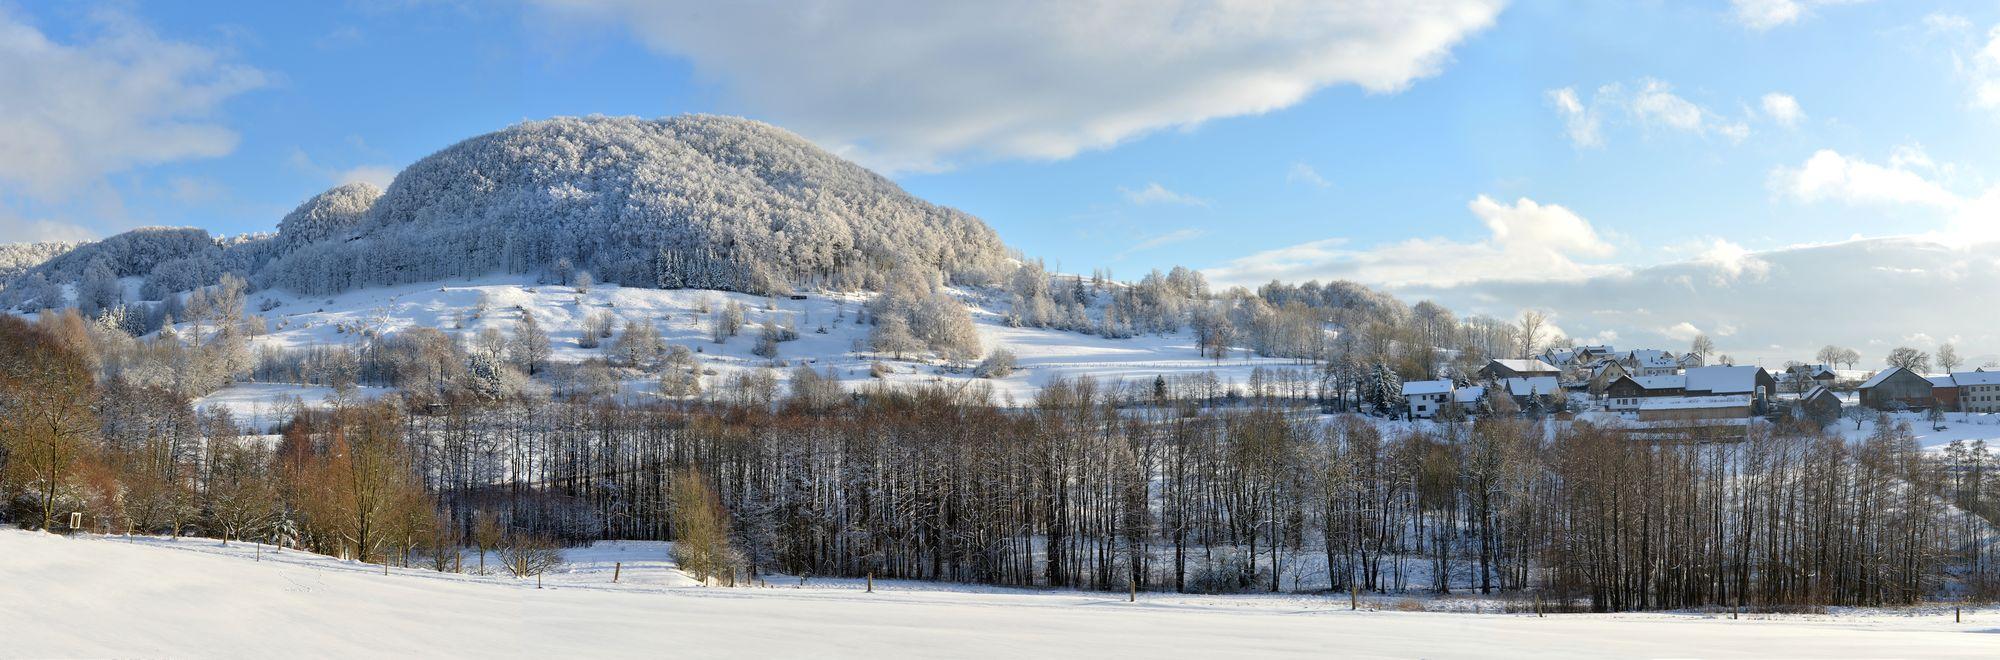 Eube im Winter